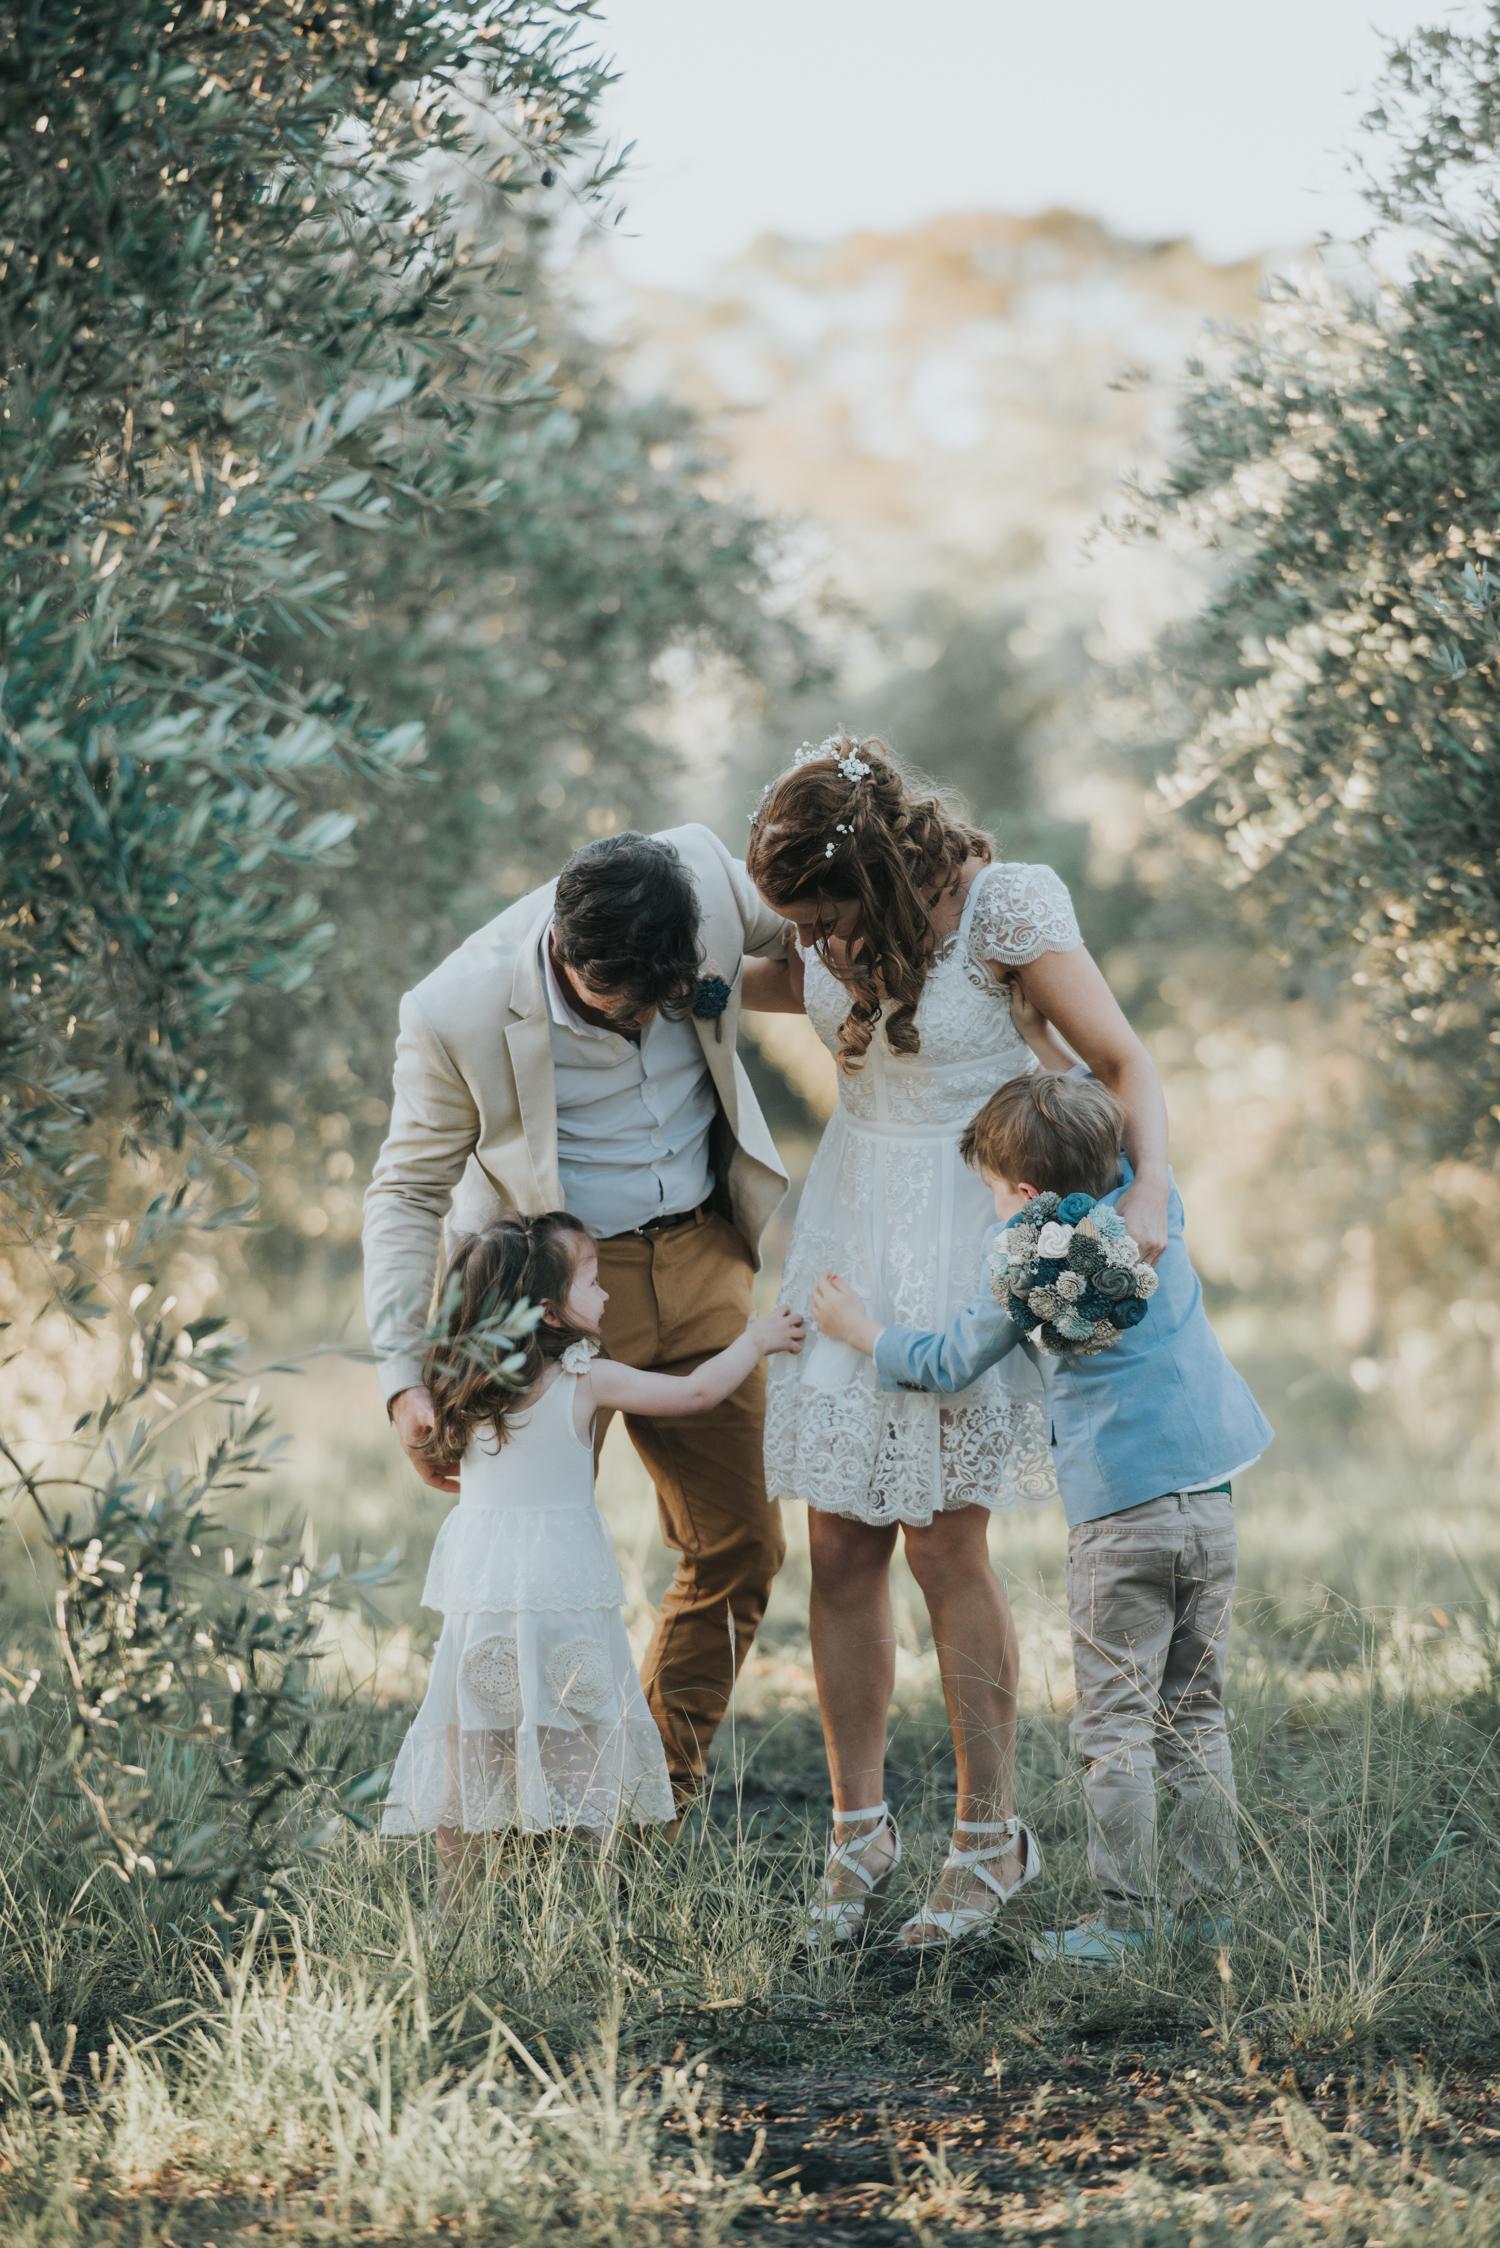 Brisbane Wedding Photographer | Engagement Photography-55.jpg